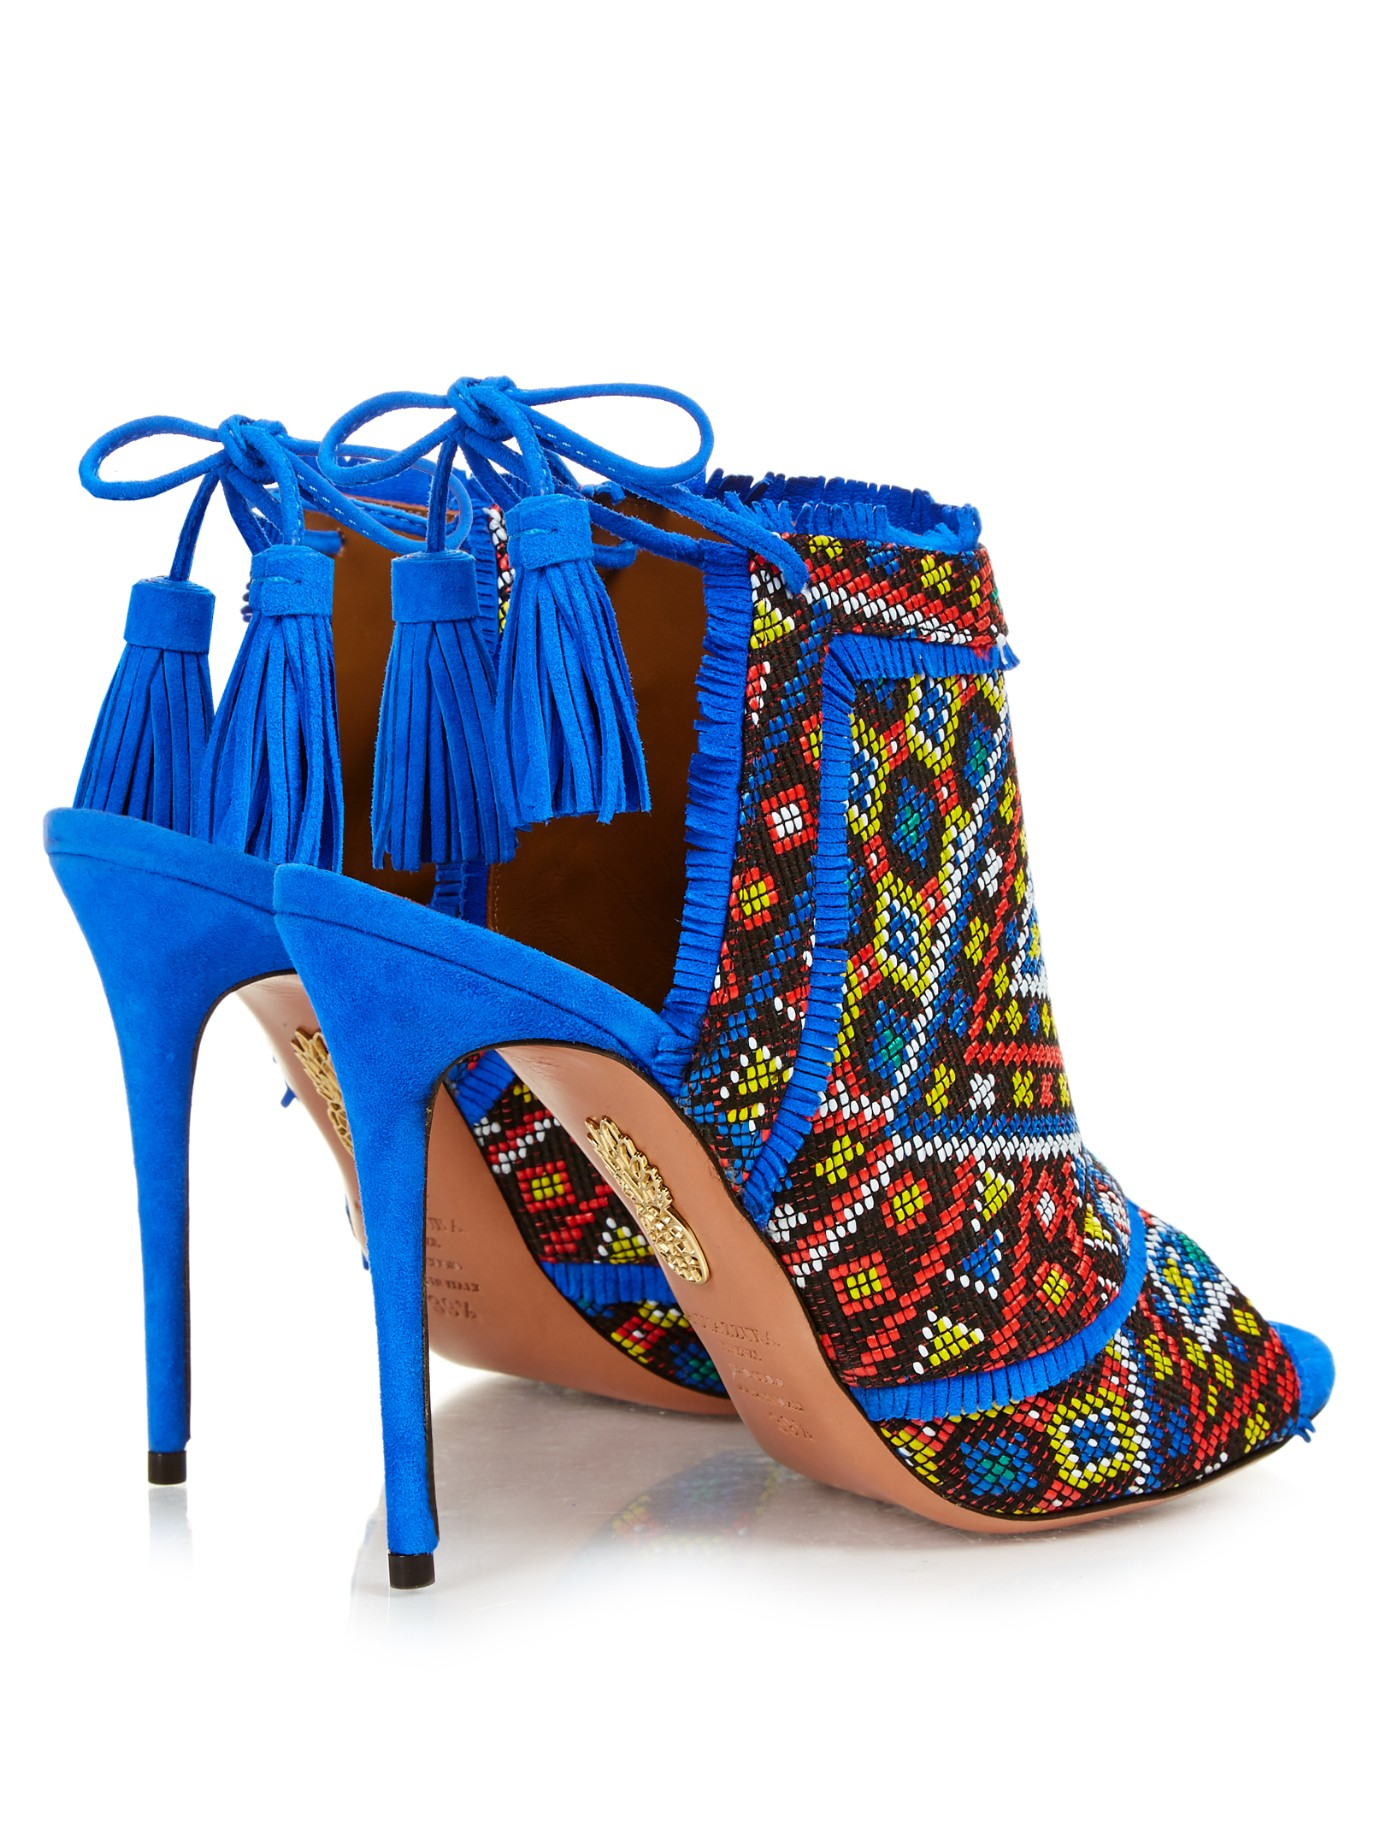 Aquazzura Beverly Hills Snakeskin Sandals In Blue Lyst